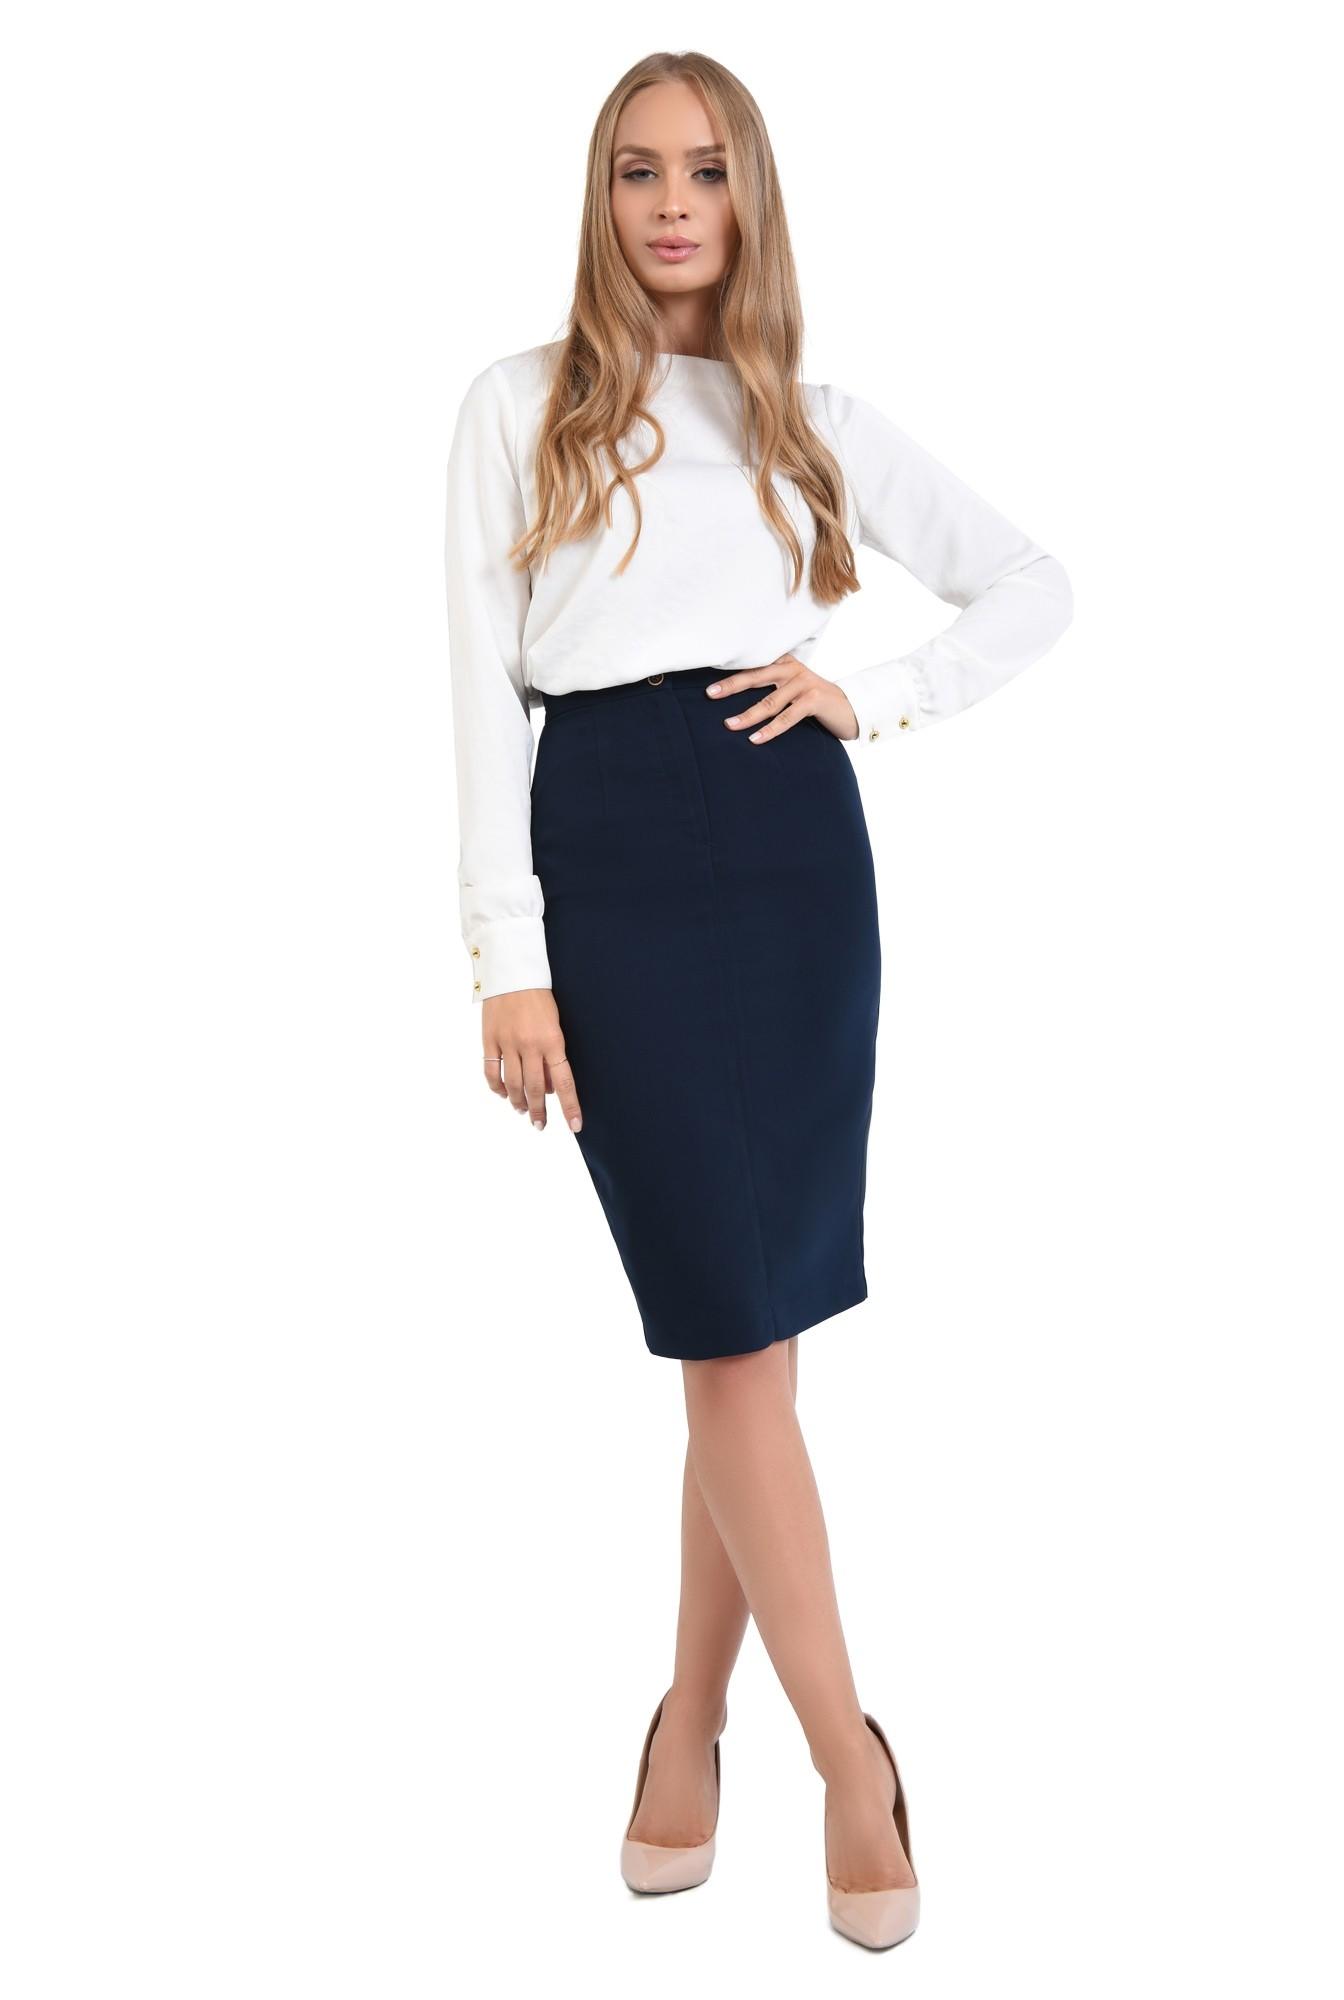 3 - 360 - bluza casual, dreapta, lejera, nasturi decorativi metalici, bluze dama